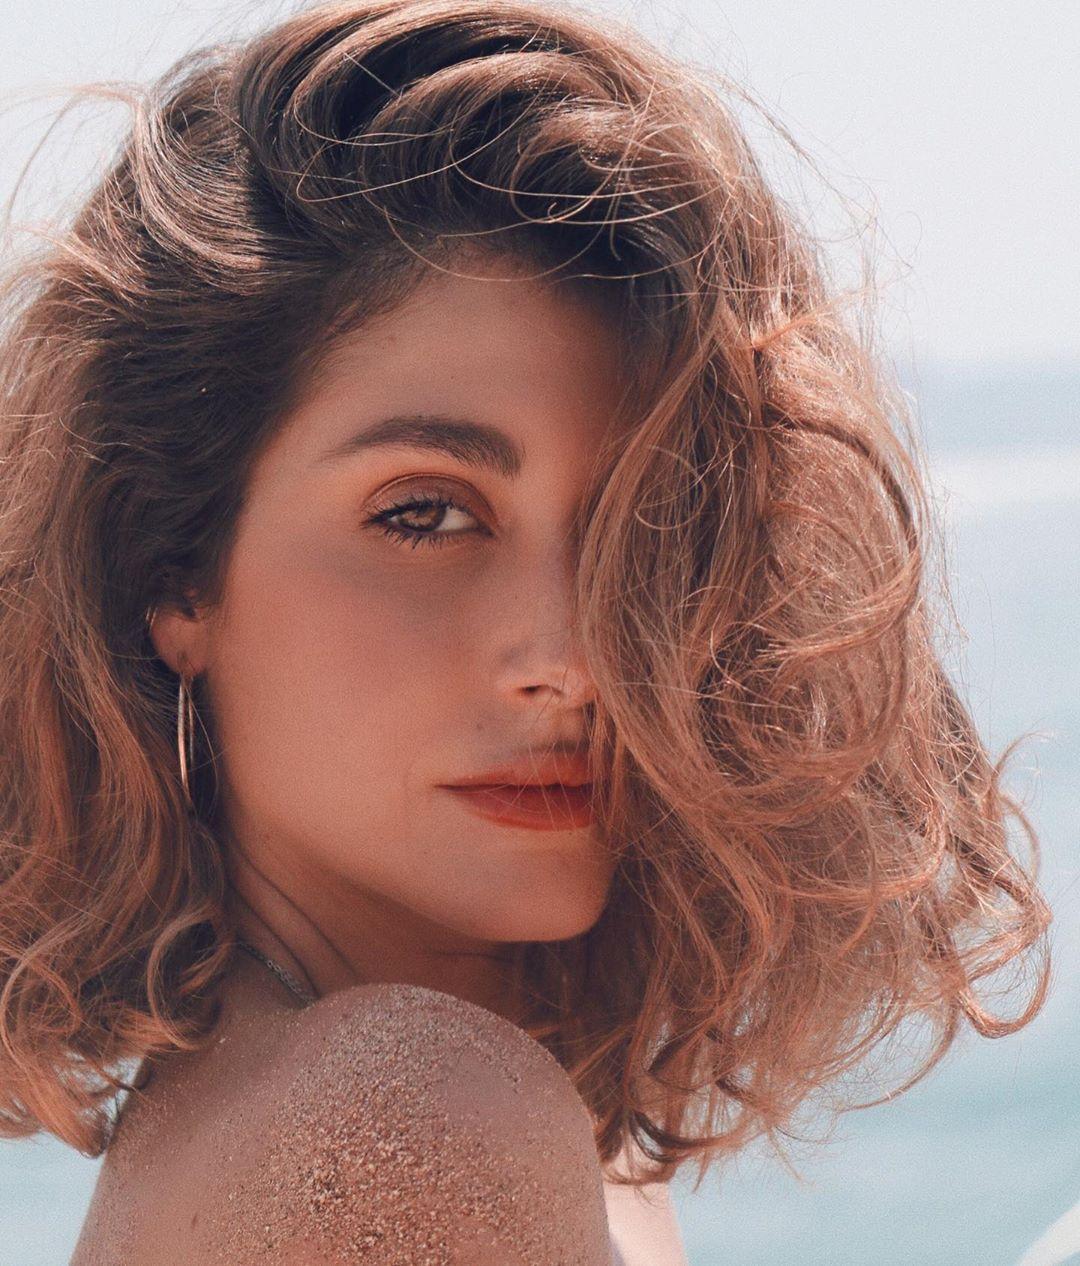 Nour Arida On Instagram Big Things Coming Up Soon X Short Hair Styles Cool Hairstyles Hair Styles